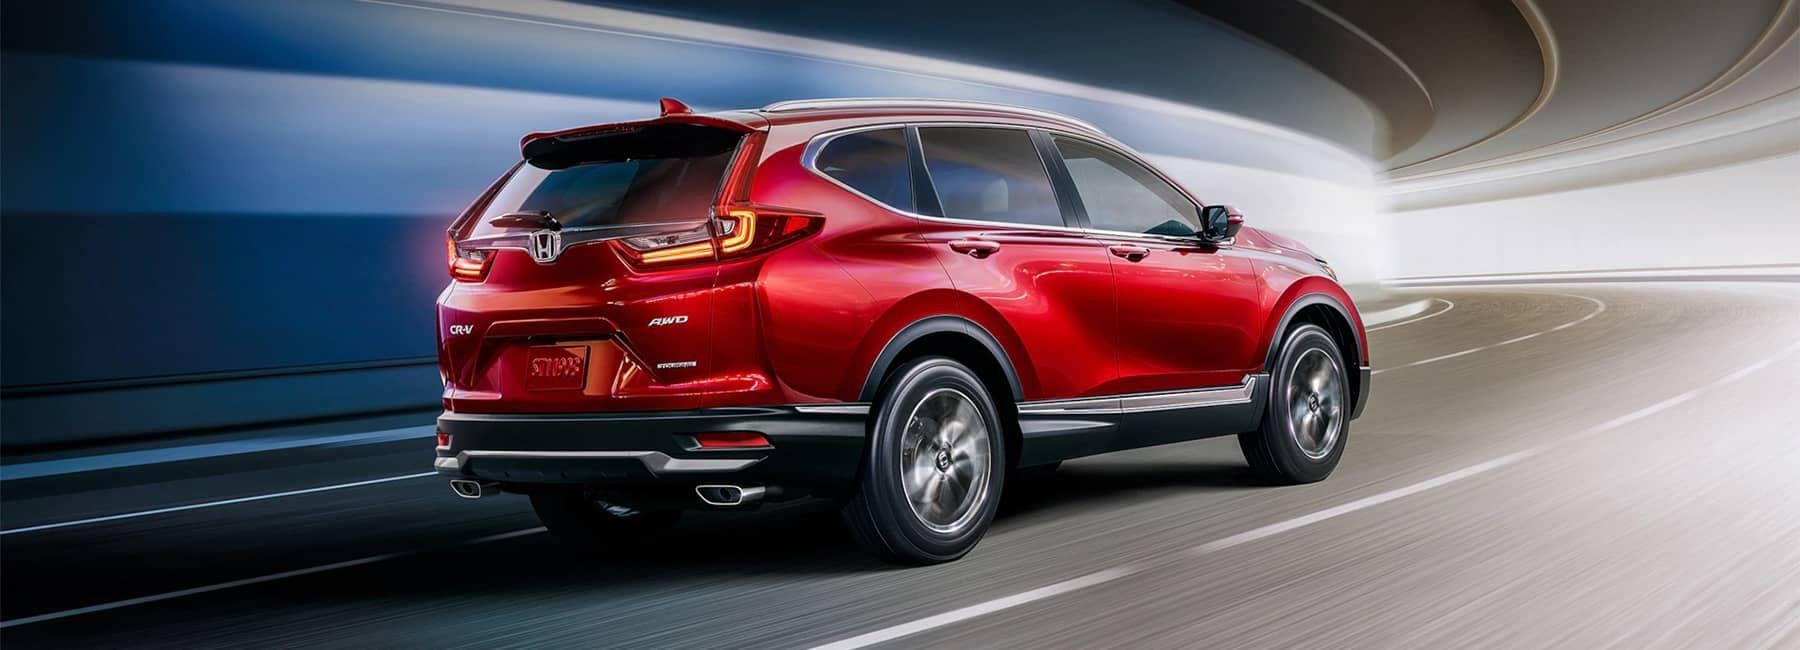 2020 Red Honda CR-V Back Angled View Driving